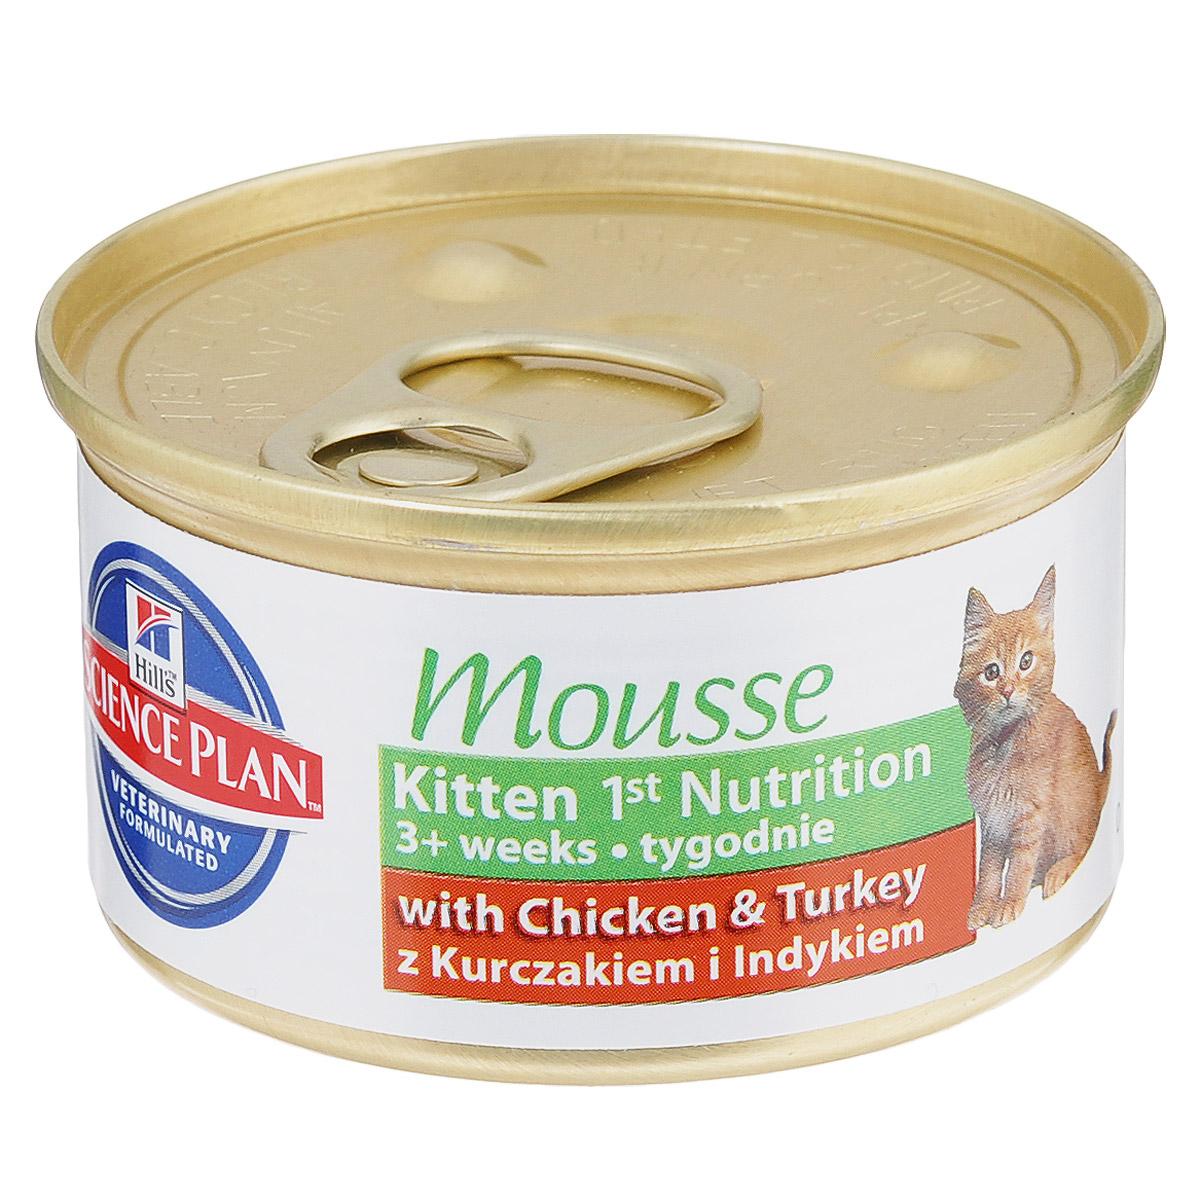 Консервы для котят Hill's Kitten, нежный мусс с курицей, 85 г консервы для котят vita pro luxe мусс с курицей 85 г